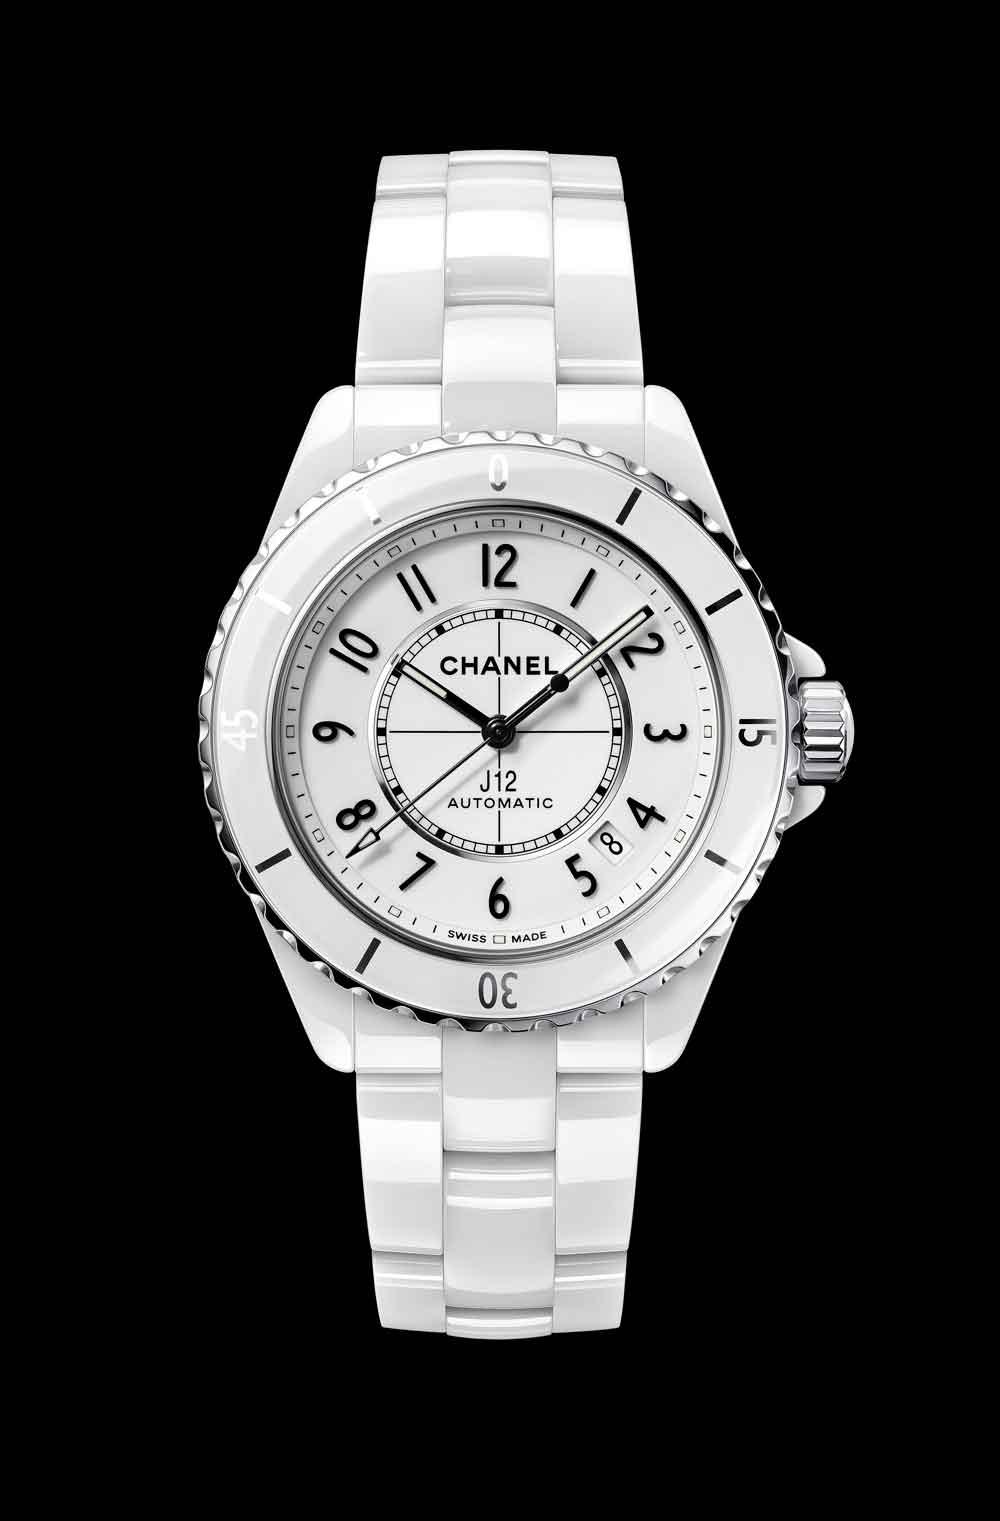 Nuevo reloj Chanel J12 cerámica blanca